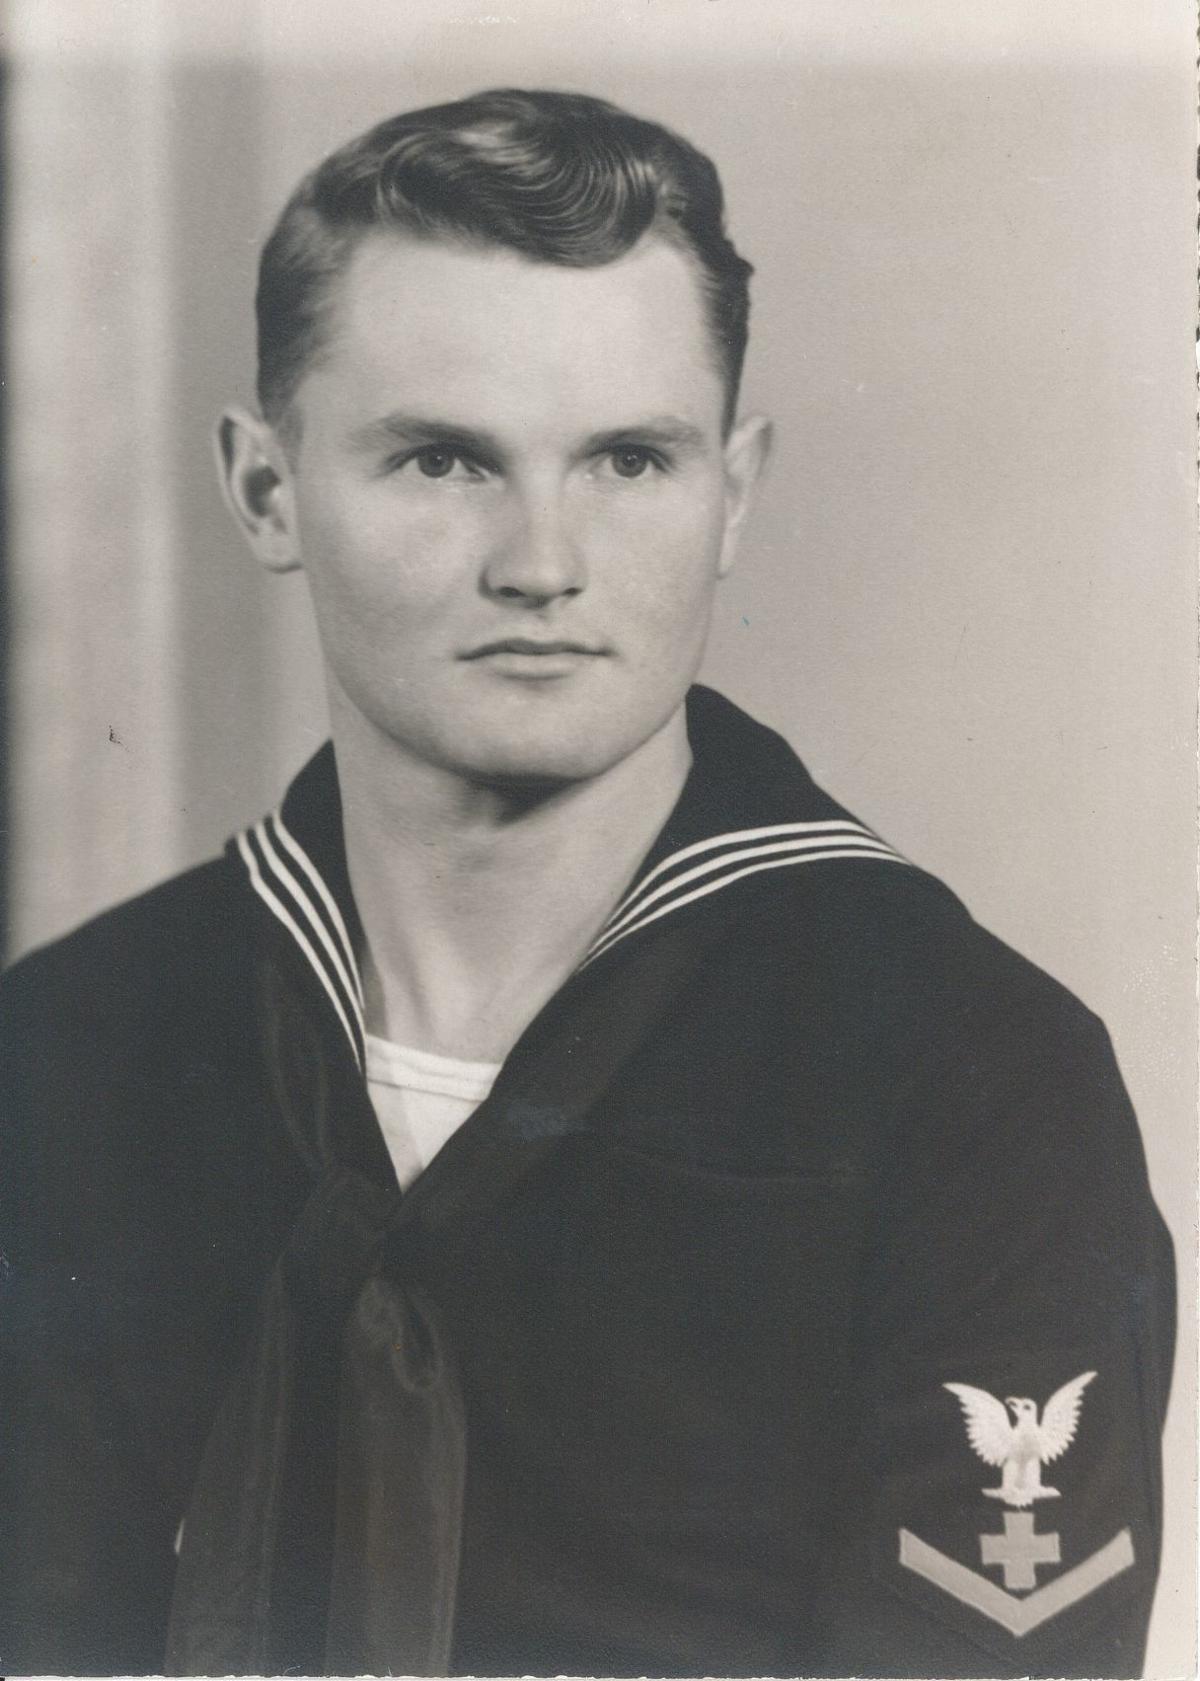 Robert R. Lowry